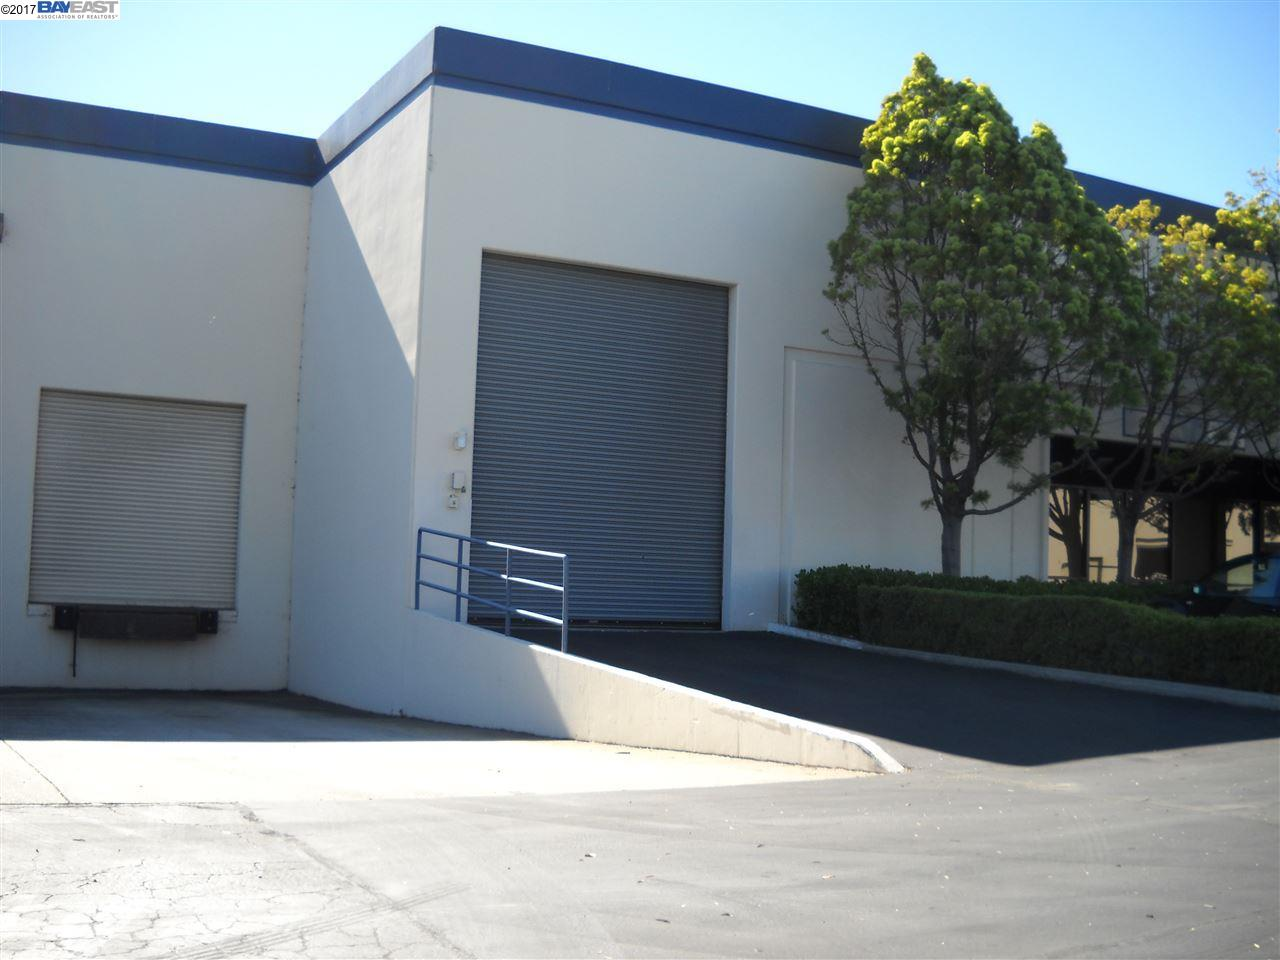 Single Family Home for Rent at 15071 Wicks Blvd 15071 Wicks Blvd San Leandro, California 94577 United States